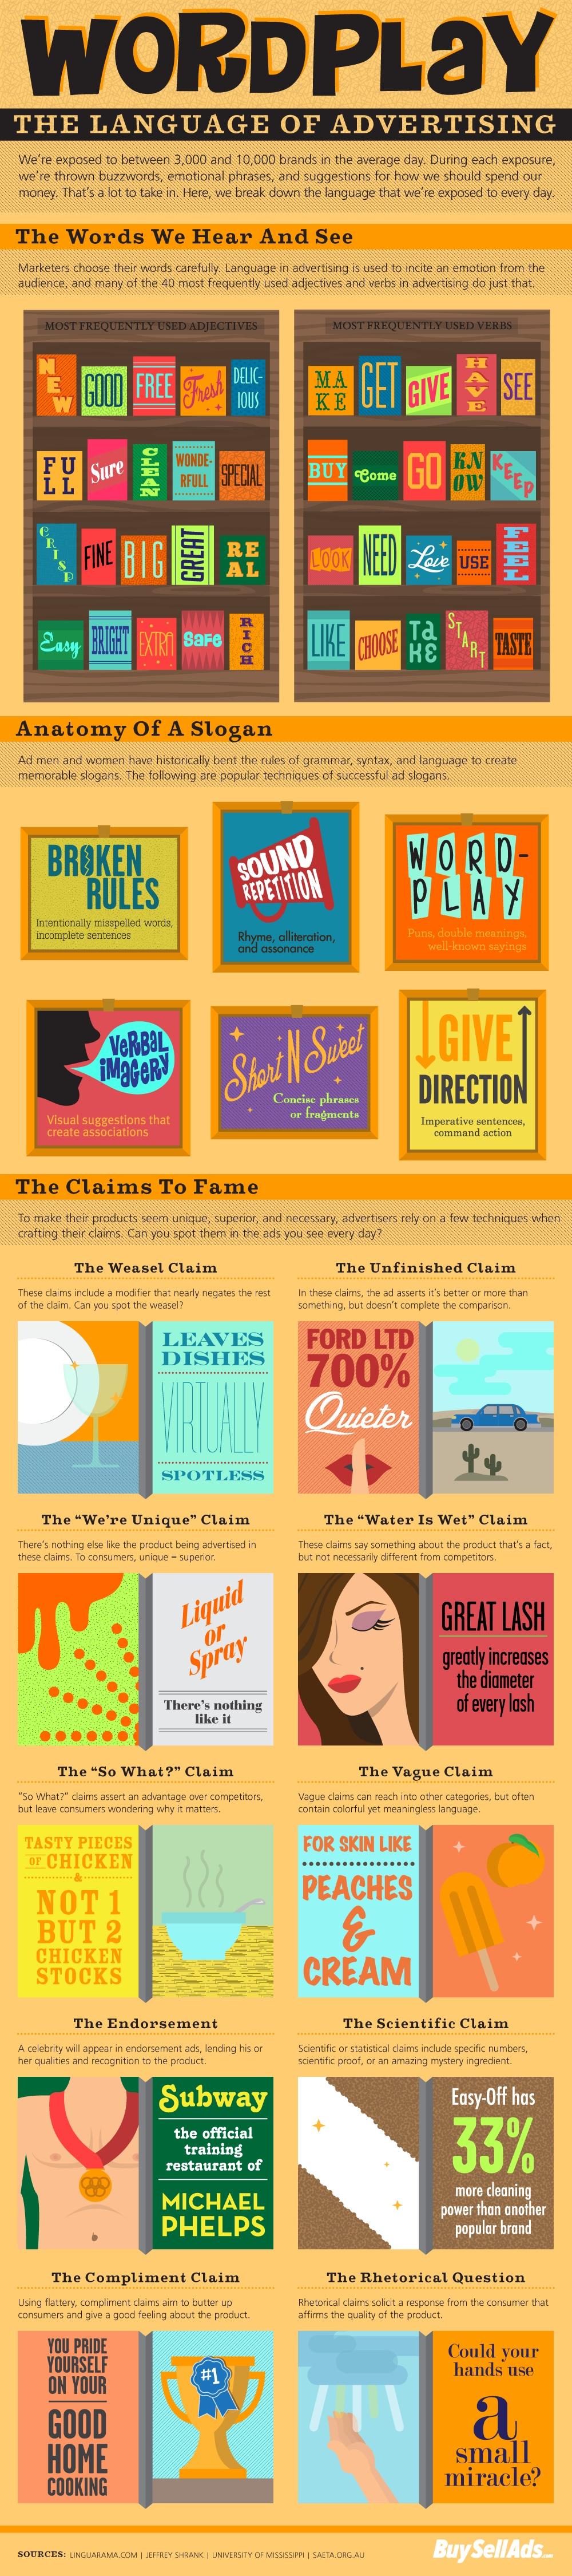 Wordplay: The Language of Advertising